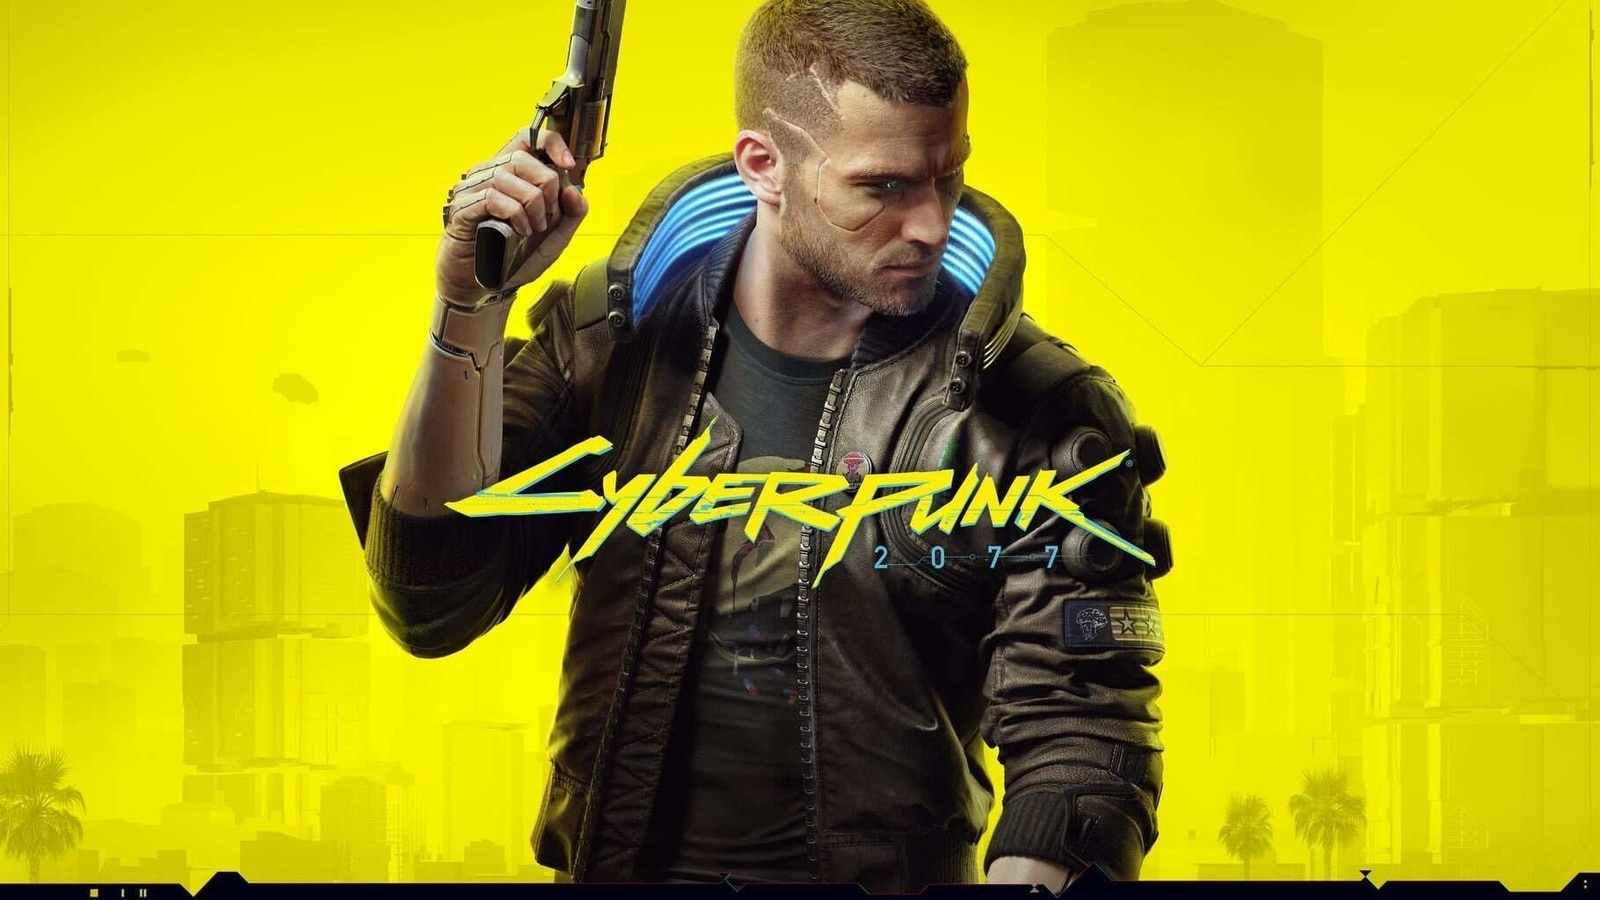 Cyberpunk 2077 DLC, expansion details were filtered online